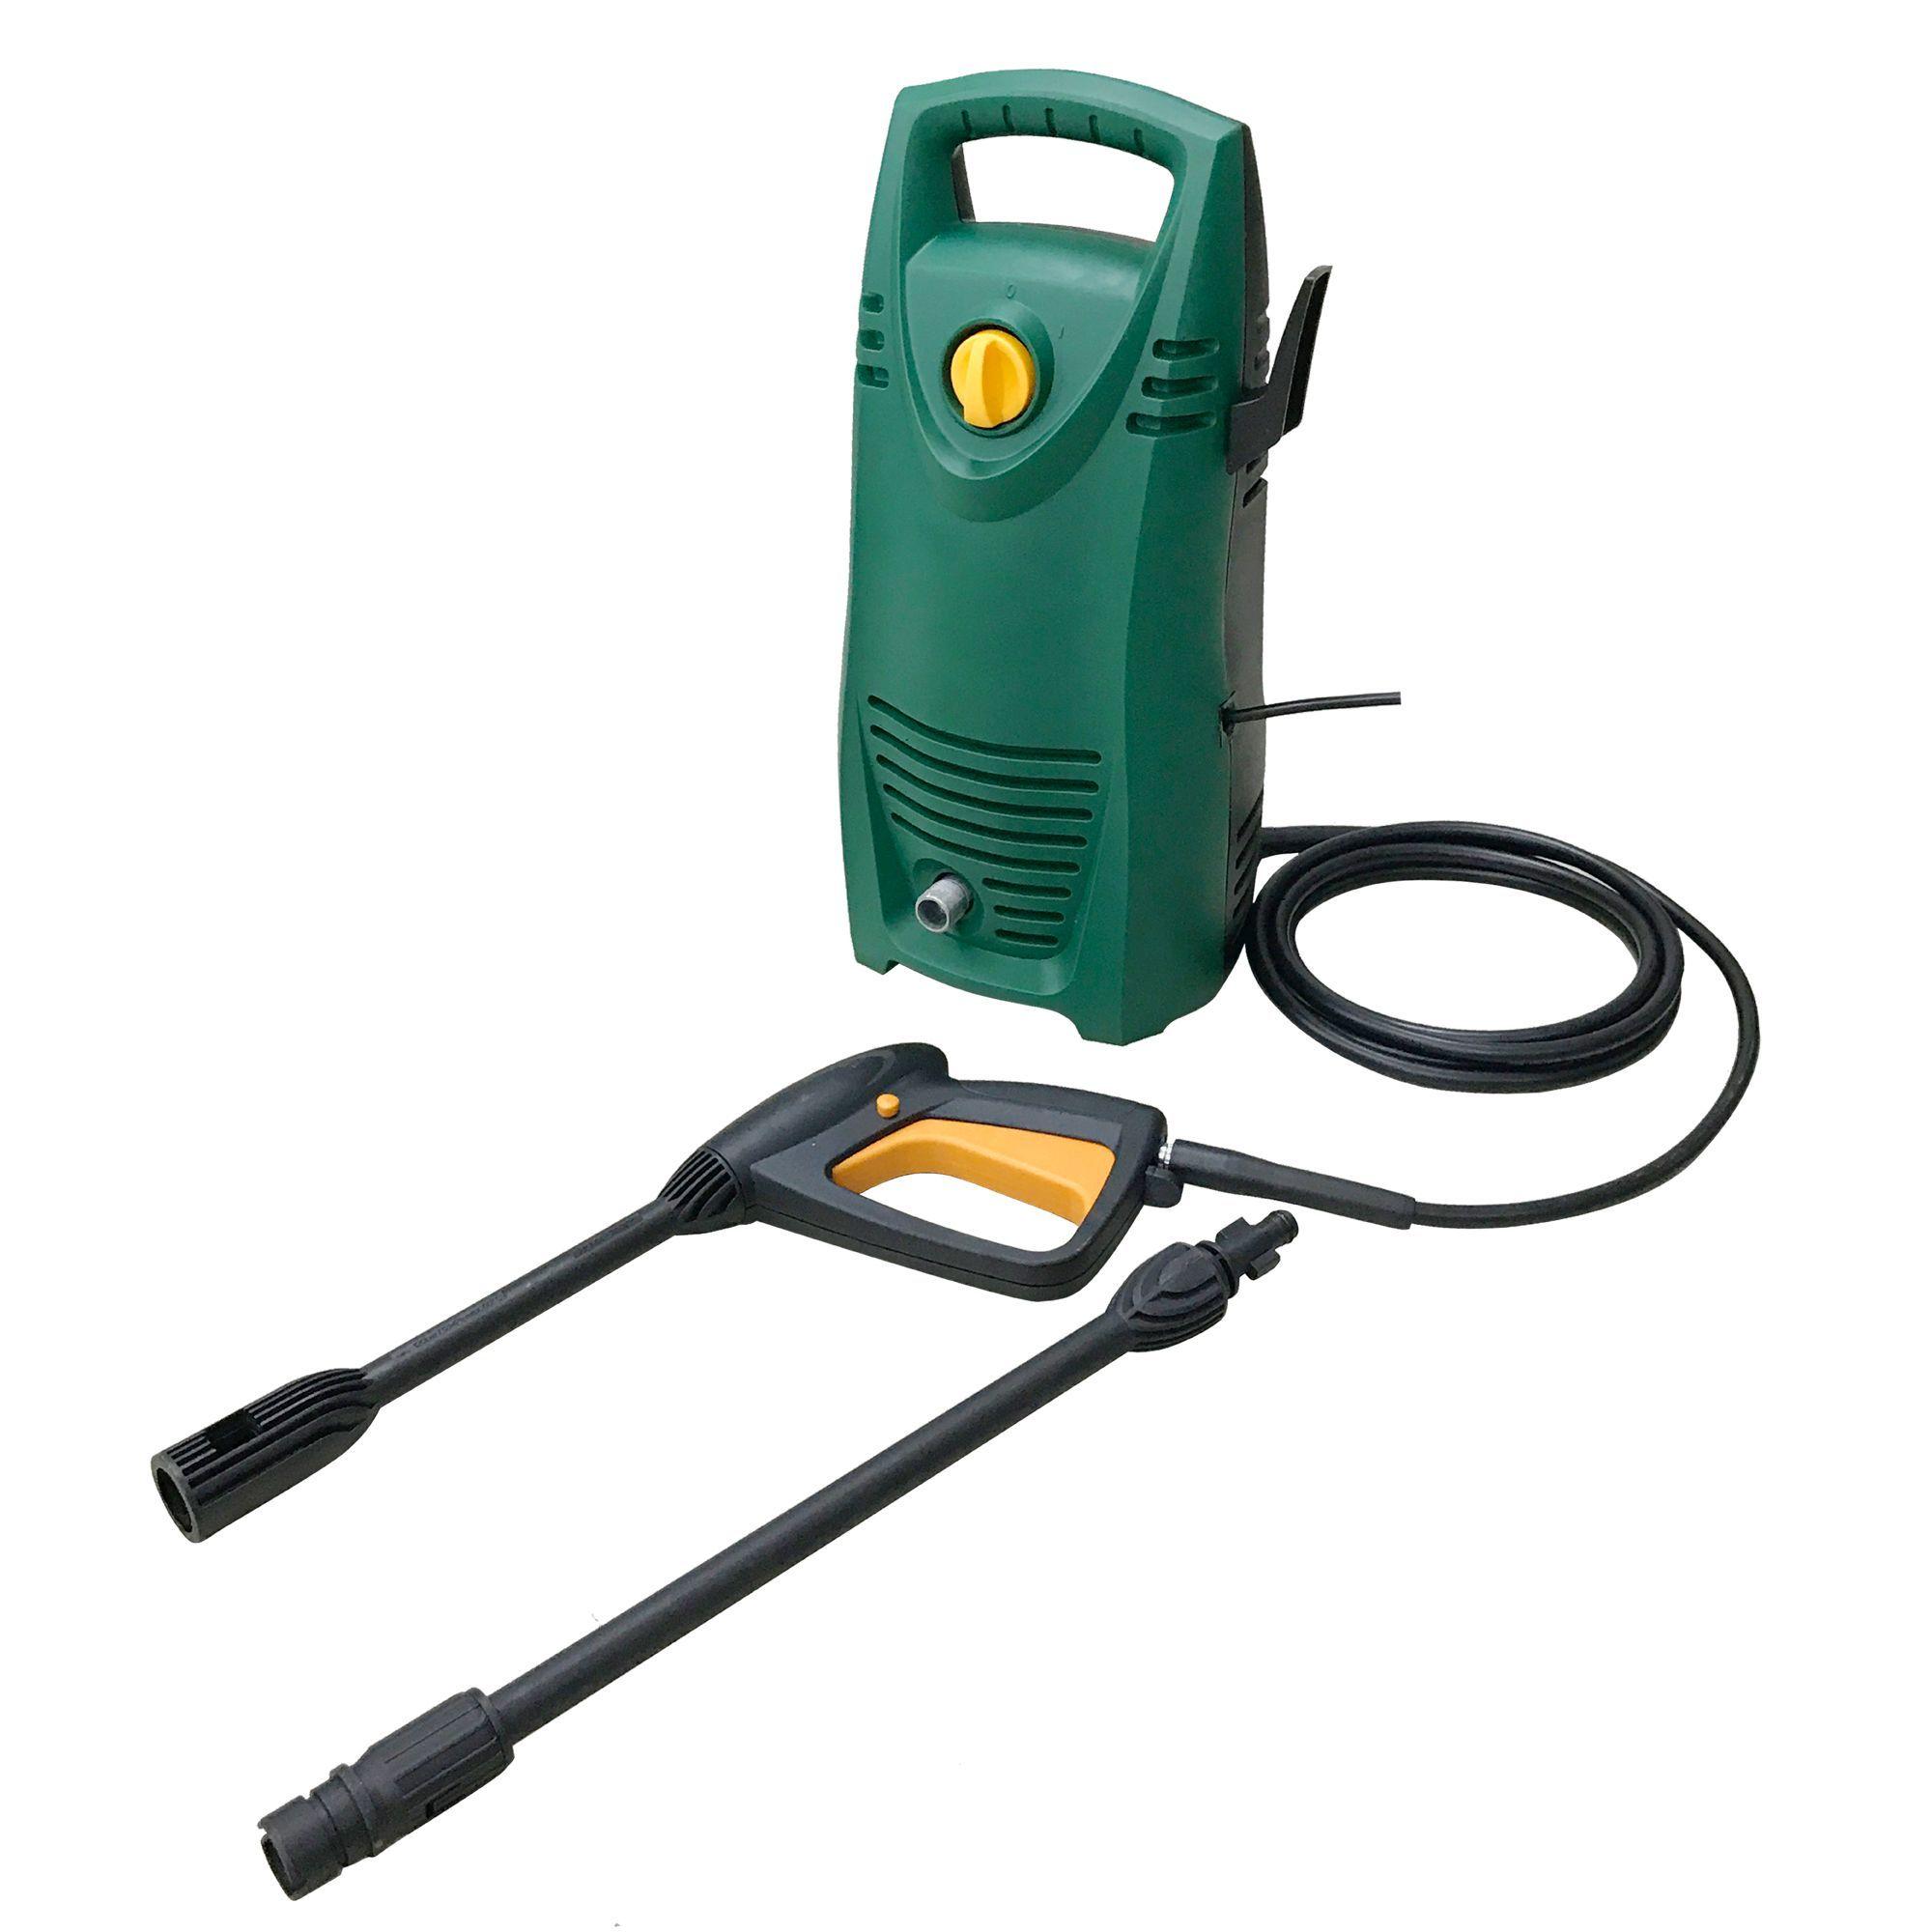 Opp 1400w Pressure Washer Departments Diy At B Amp Q Nettoyeur Haute Pression Castorama Nettoyeur